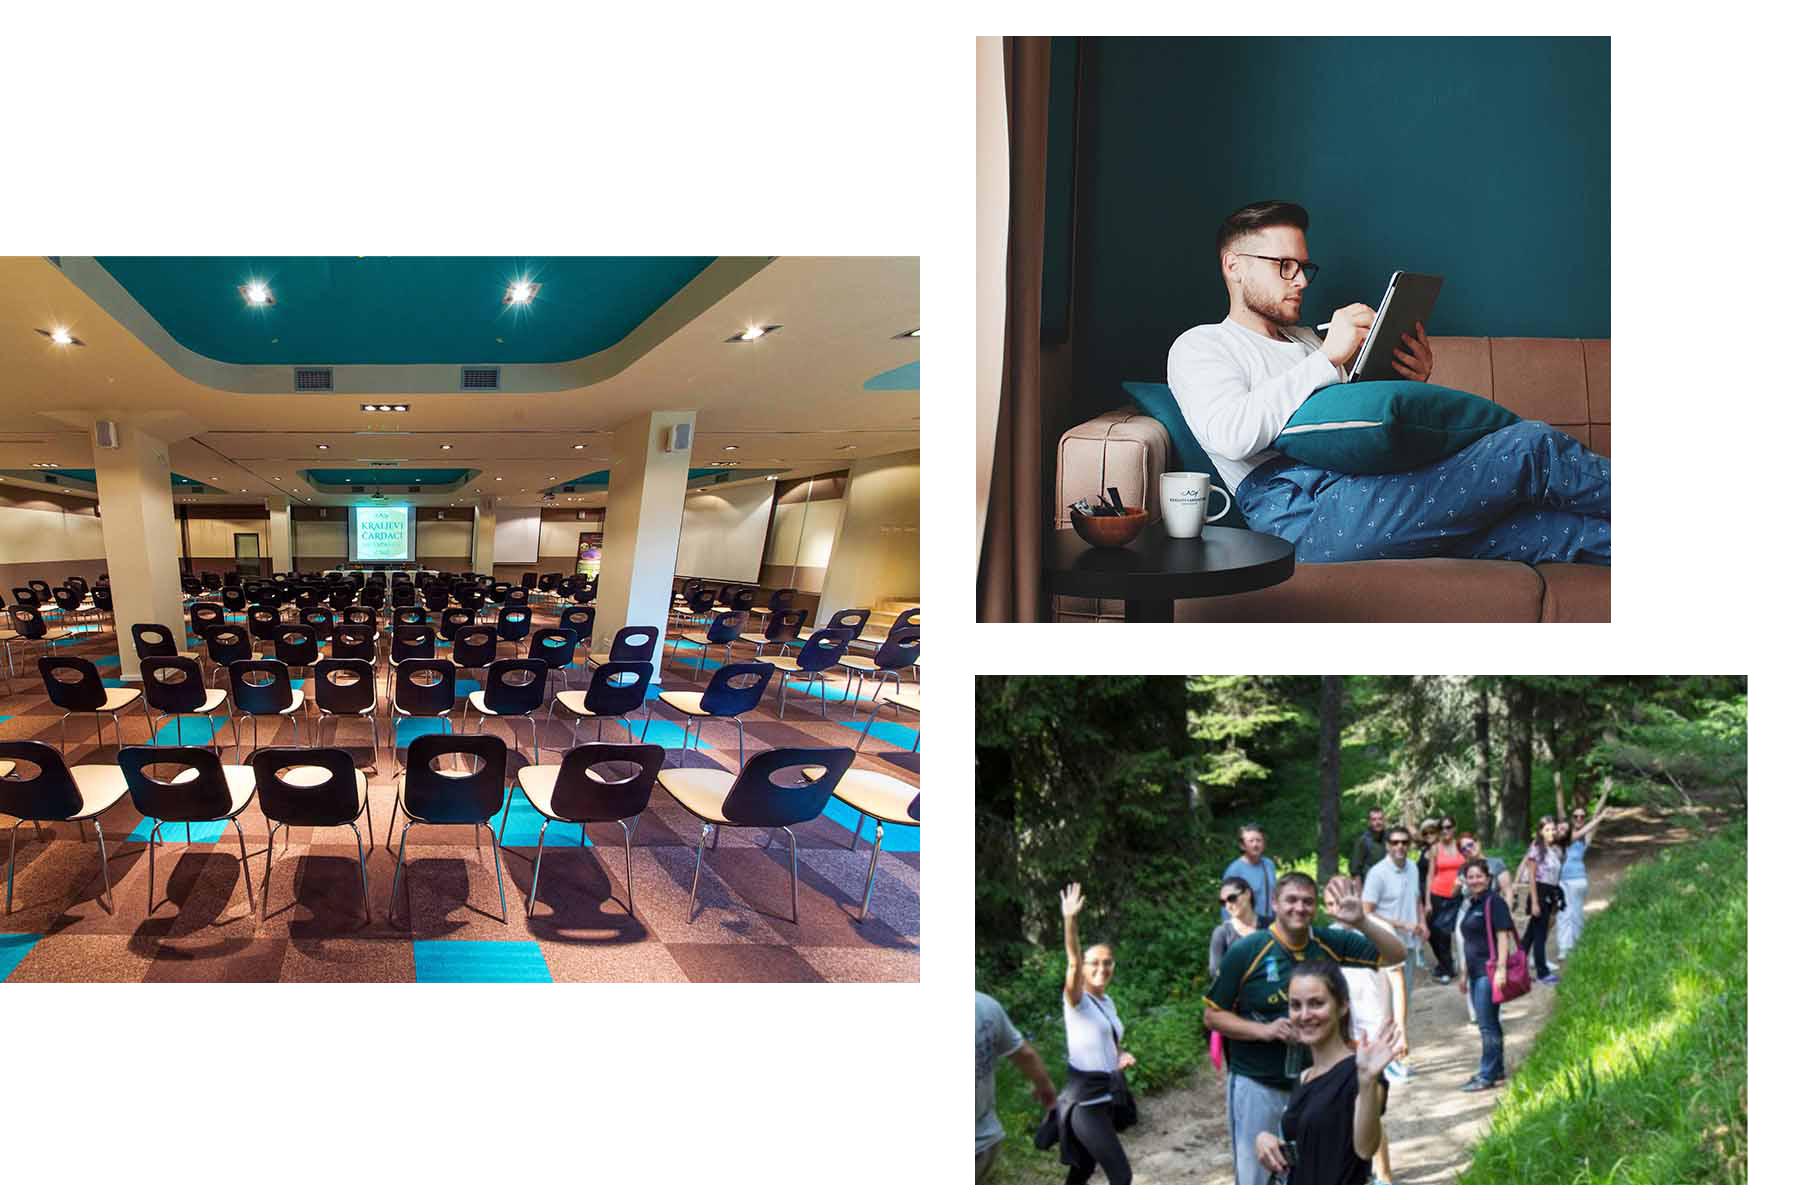 https://www.kraljevicardaci.com/wp-content/uploads/2021/04/kongress-vizual-sajt.png